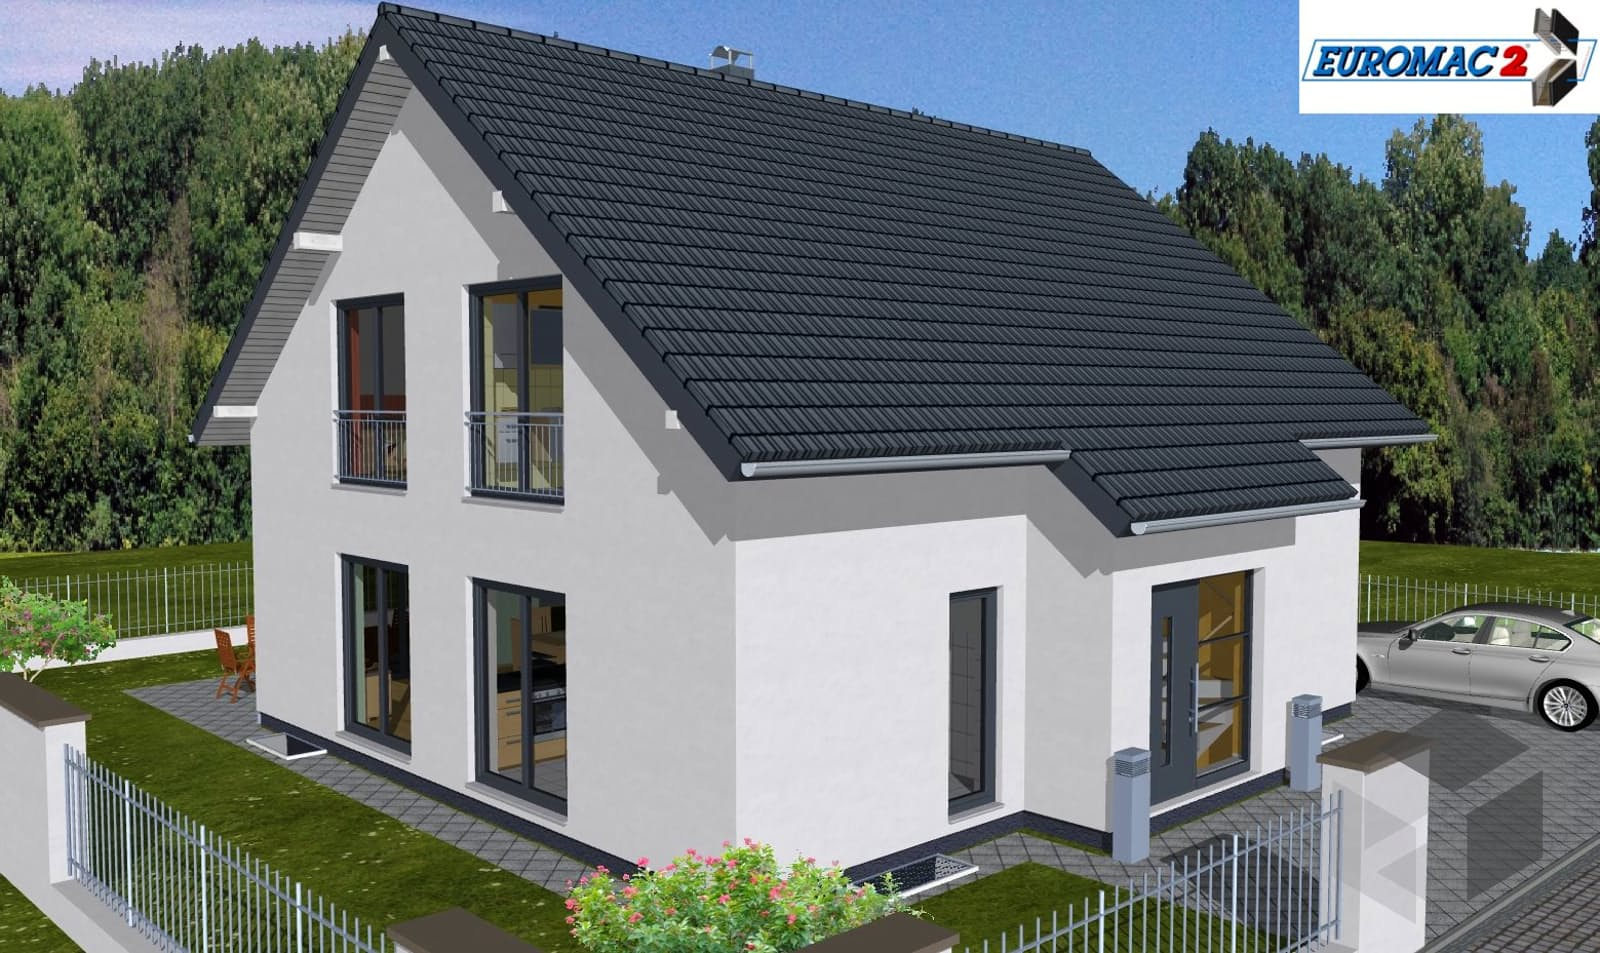 Massivhaus Bausatzhaus Bis 100 000 Hauser Anbieter